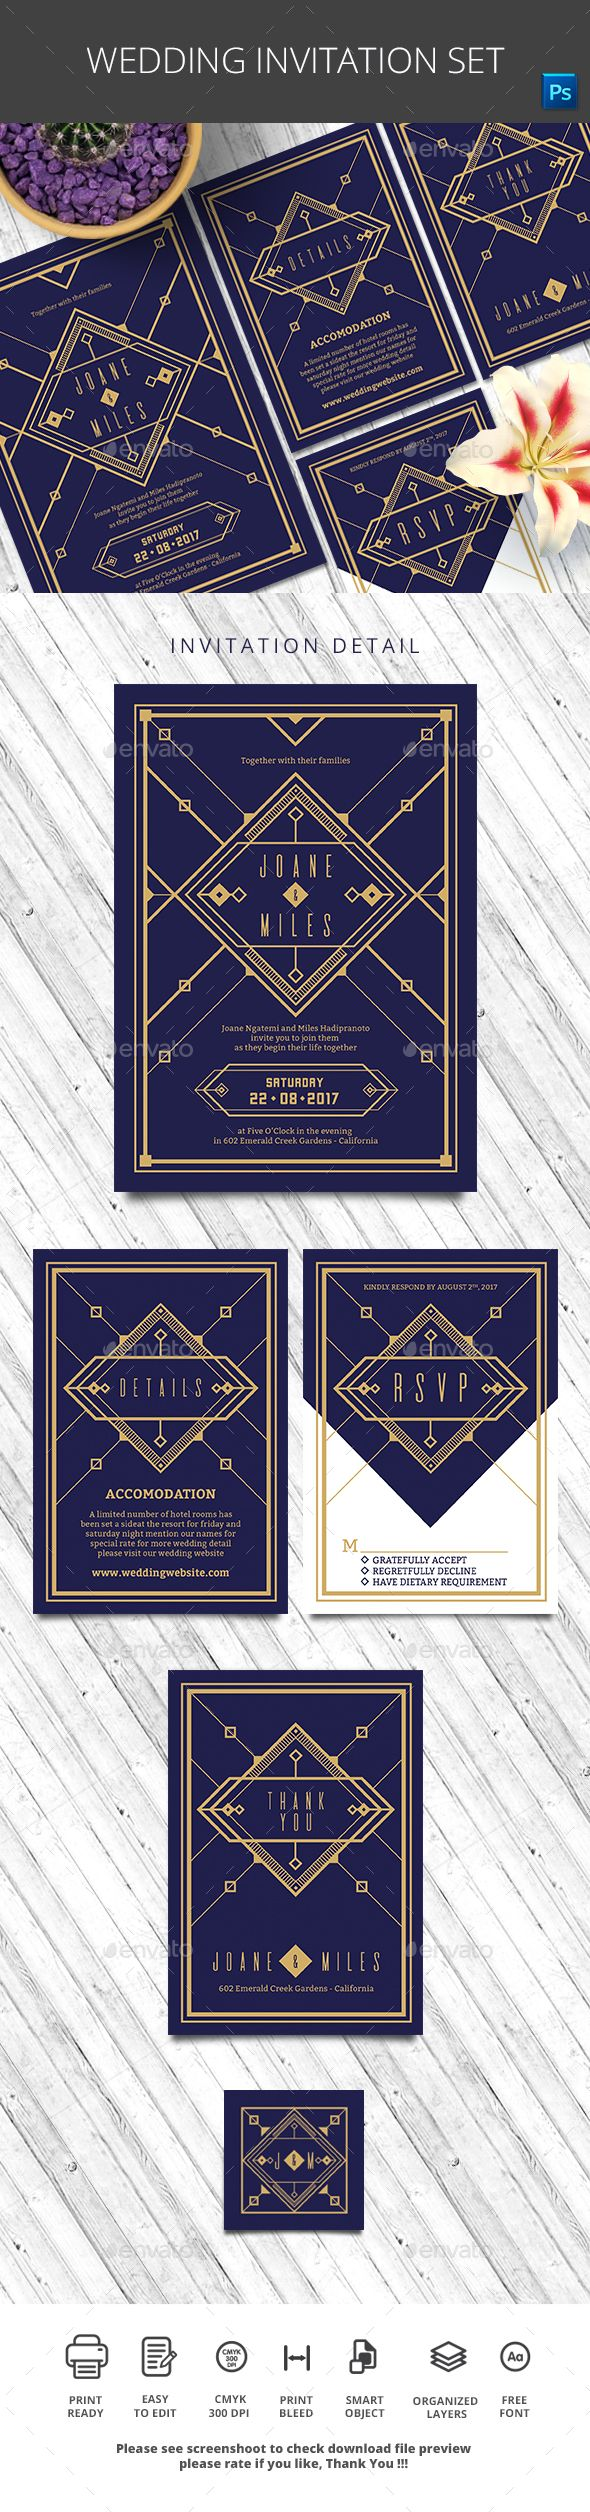 wedding invitation template themeforest%0A Wedding Invitation Set